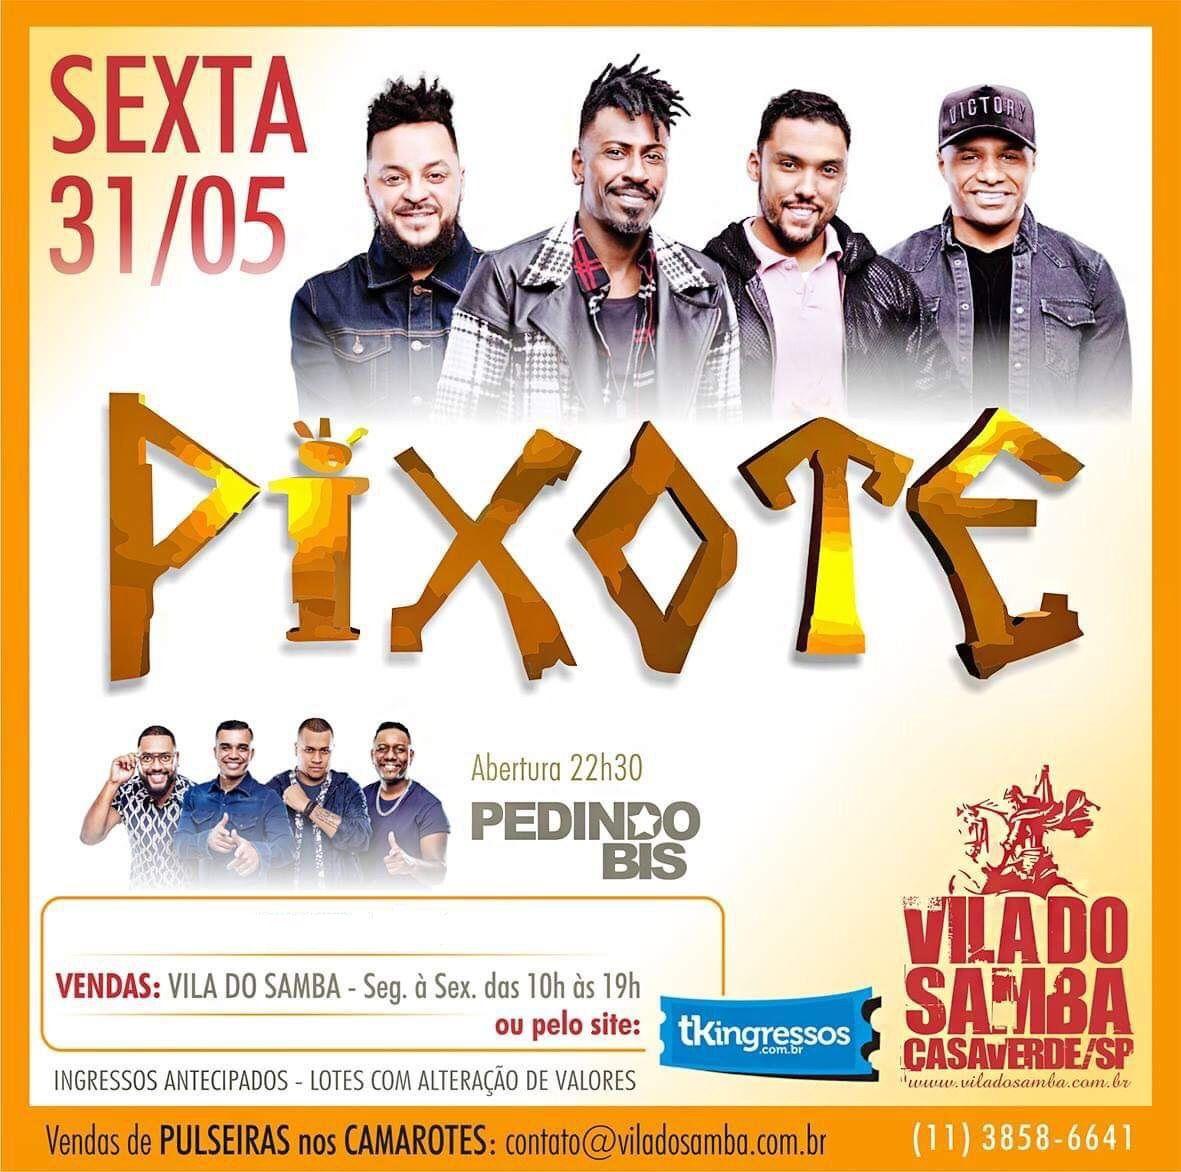 Pixote - Vila do Samba - 31/05/19 - São Paulo - SP